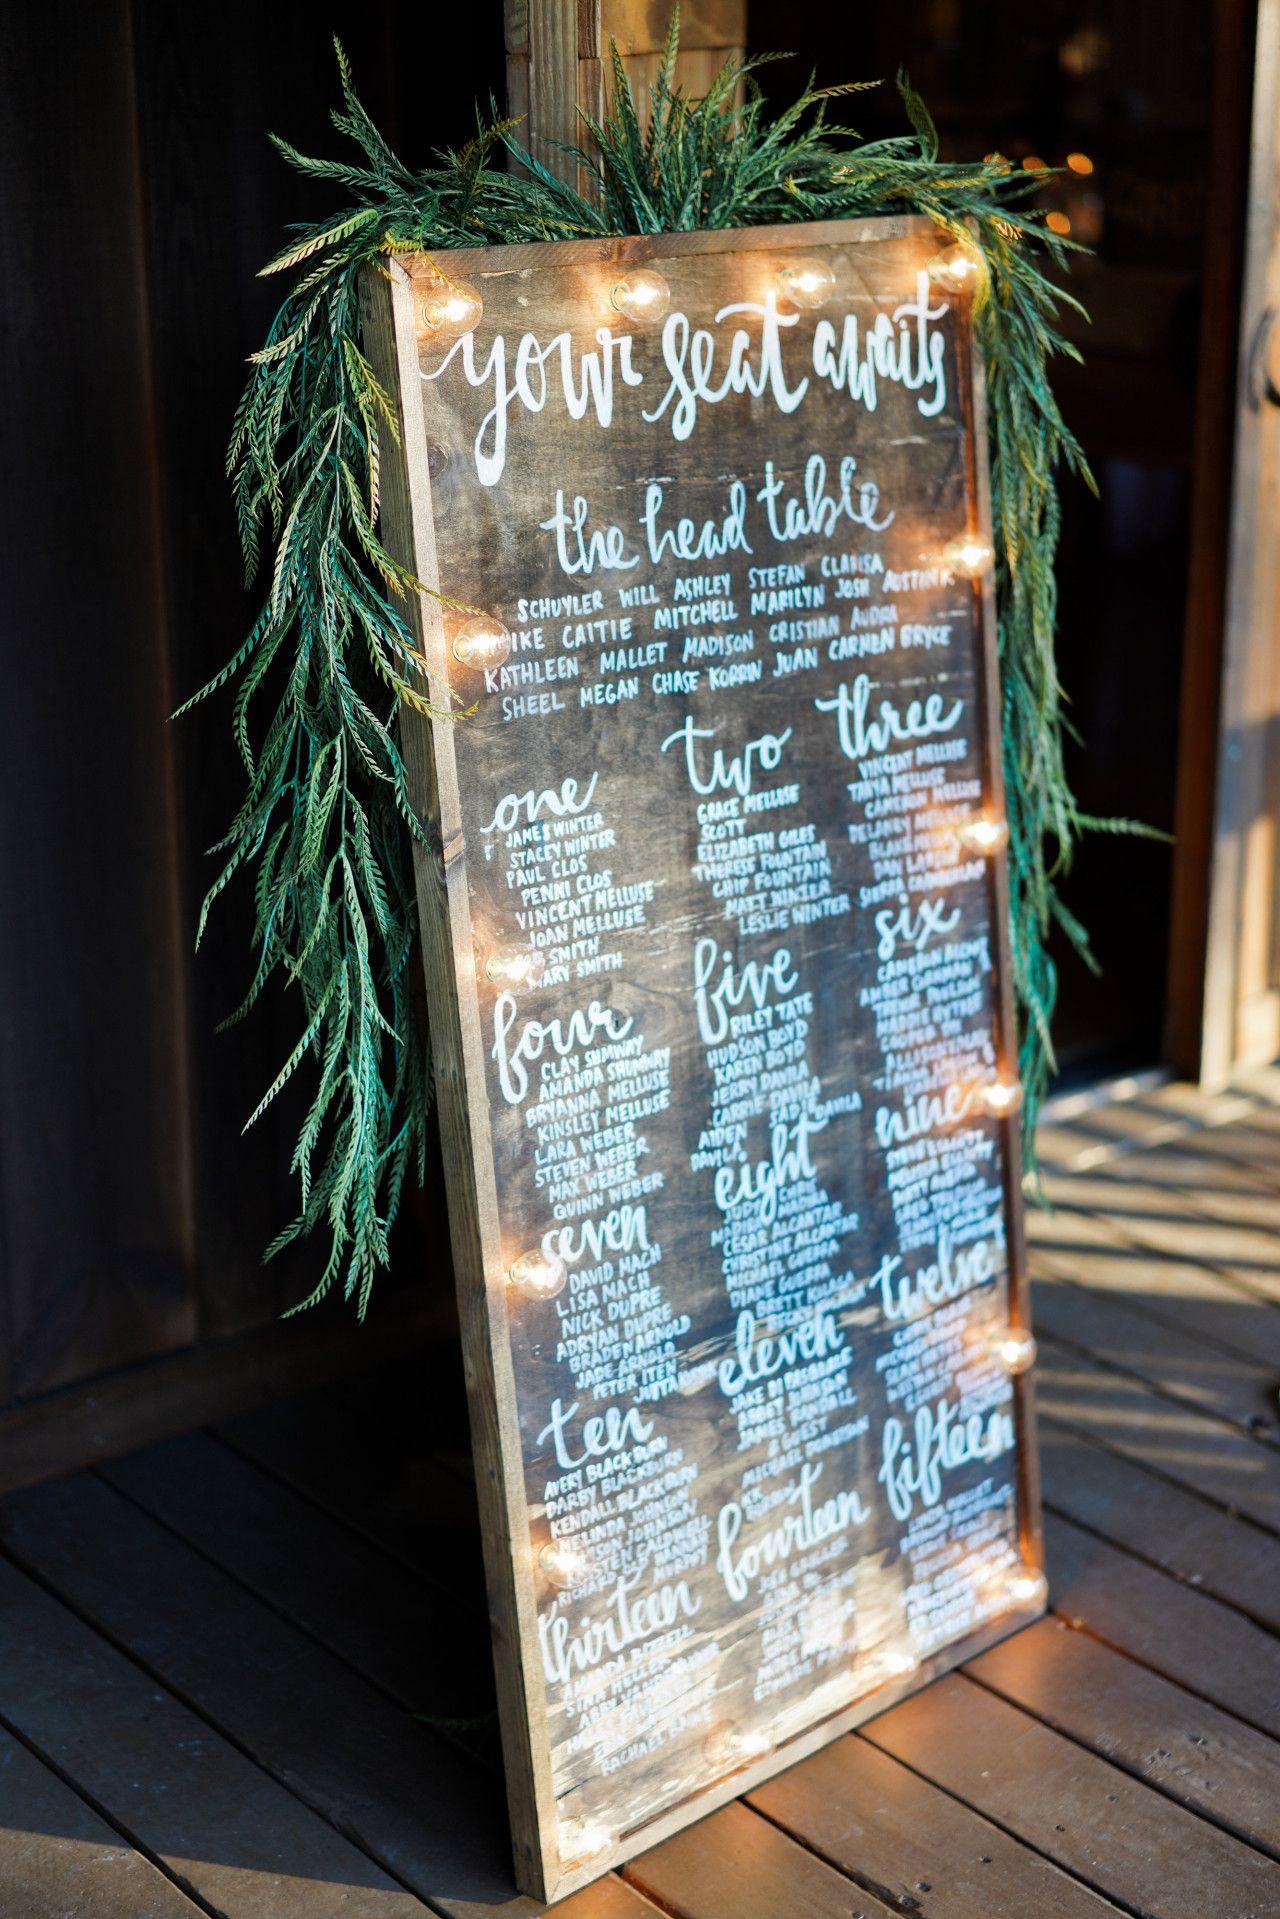 Wooden wedding decor ideas  wedding seating sign  wedding reception sign ideas  natural wooden